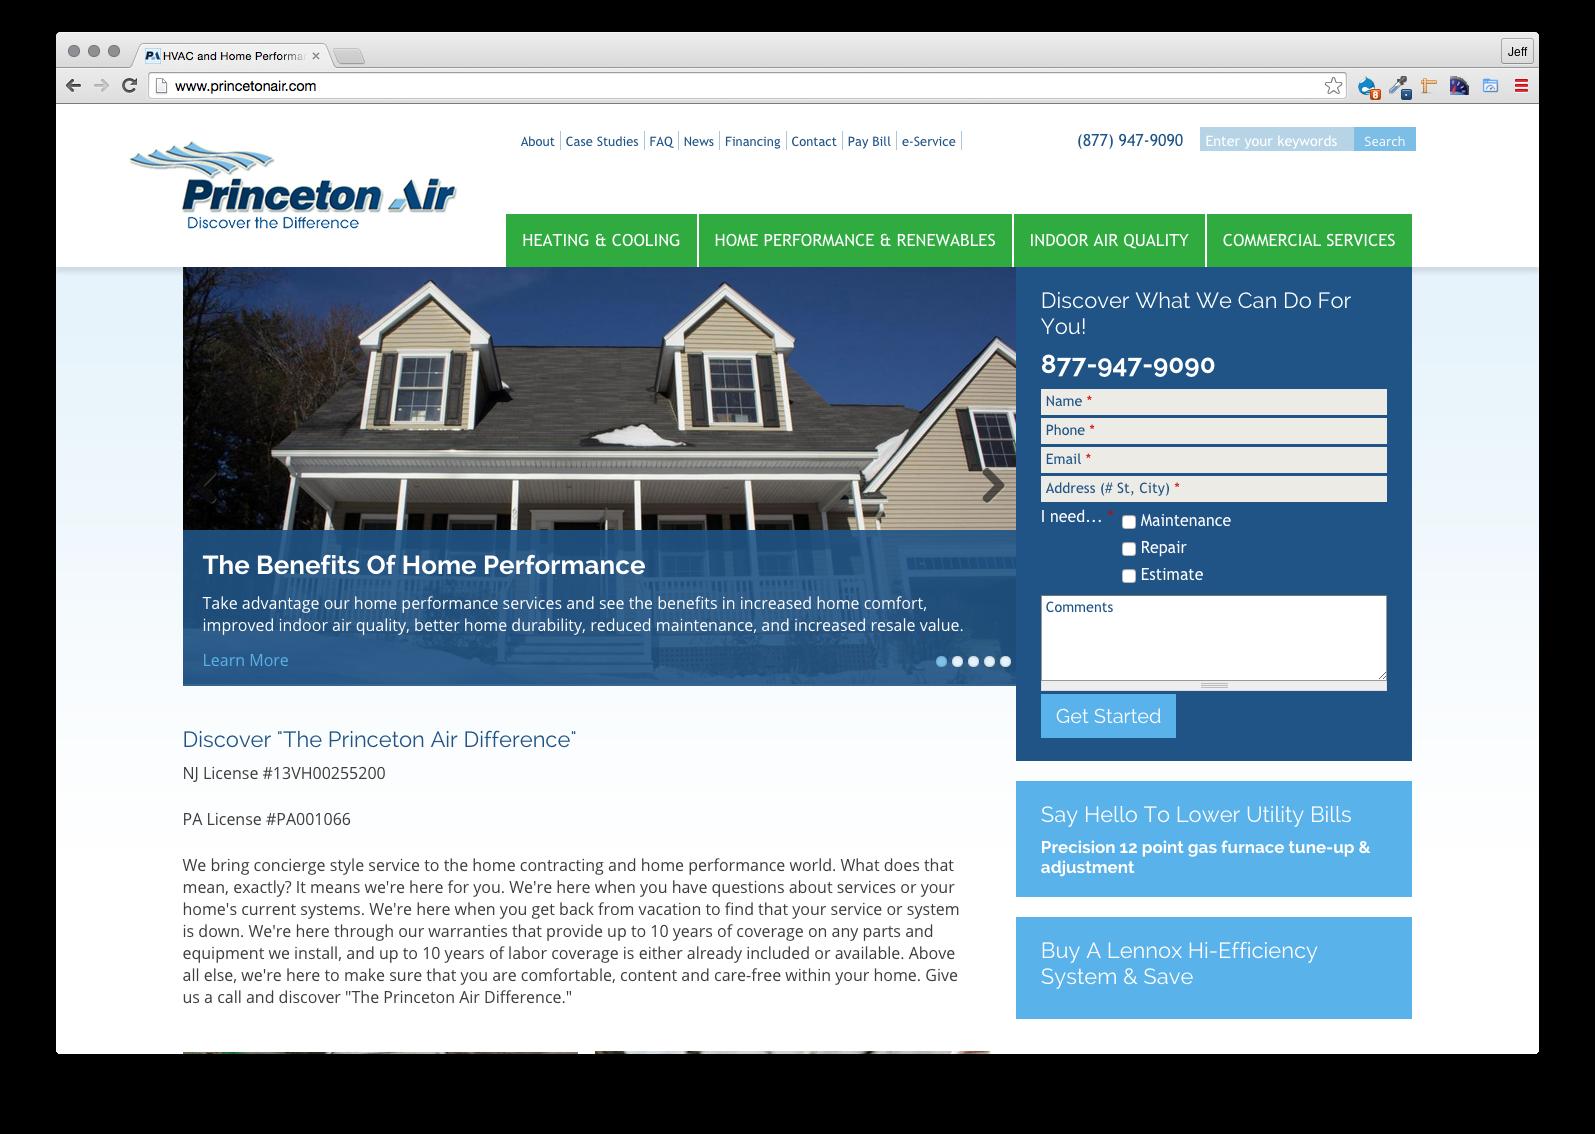 Princeton Air, Website